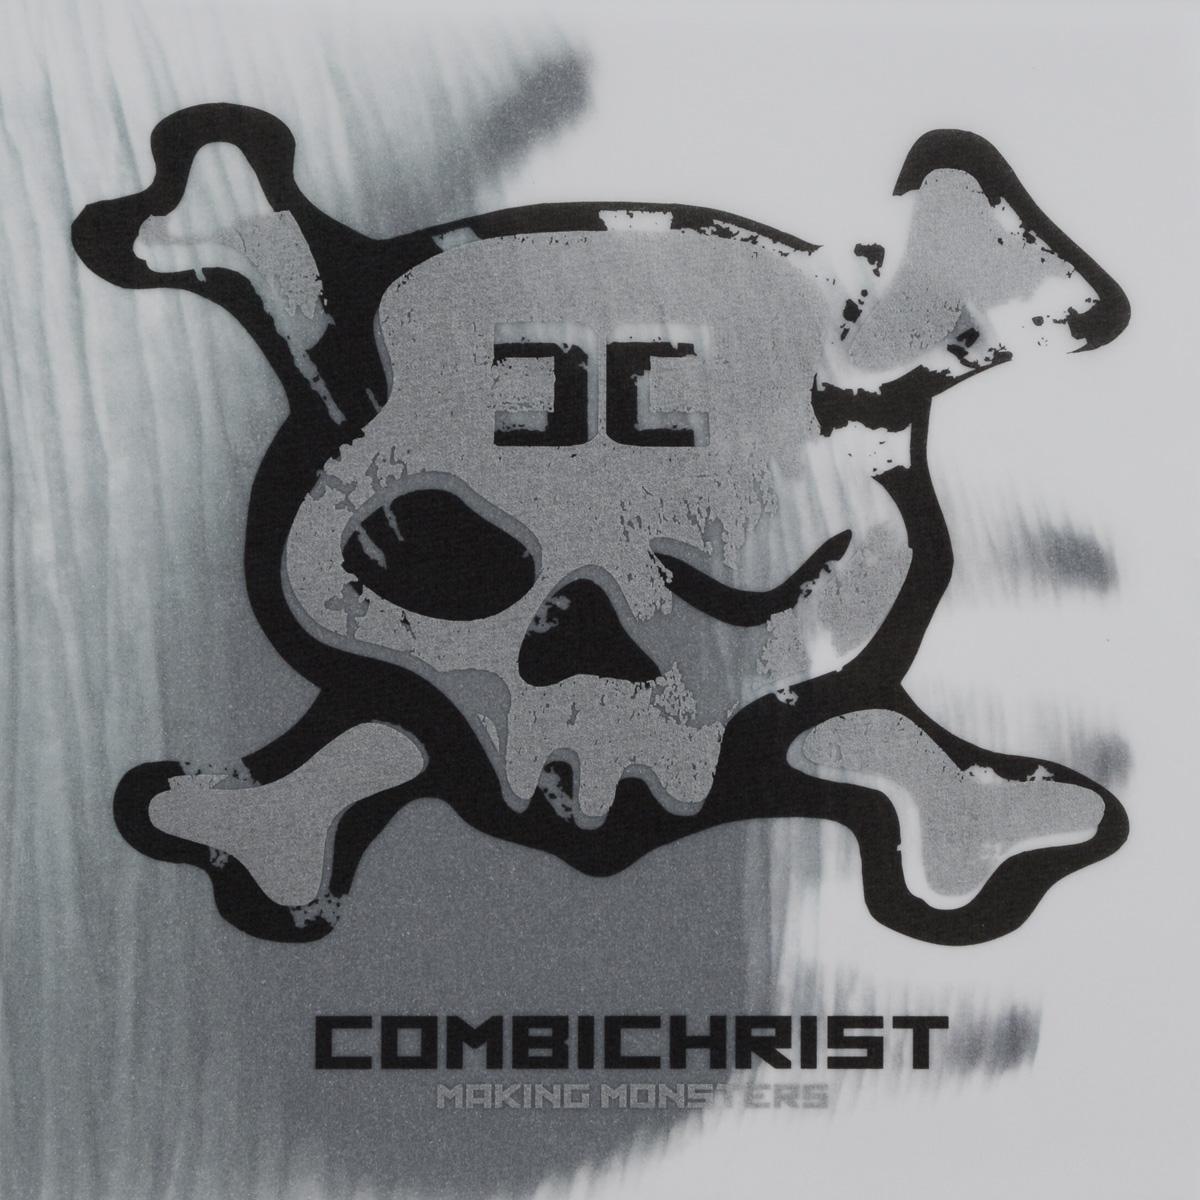 Combichrist Combichrist. Making Monsters ciro marchetti tarot of dreams таро снов набор 83 карты с книгой на английском языке